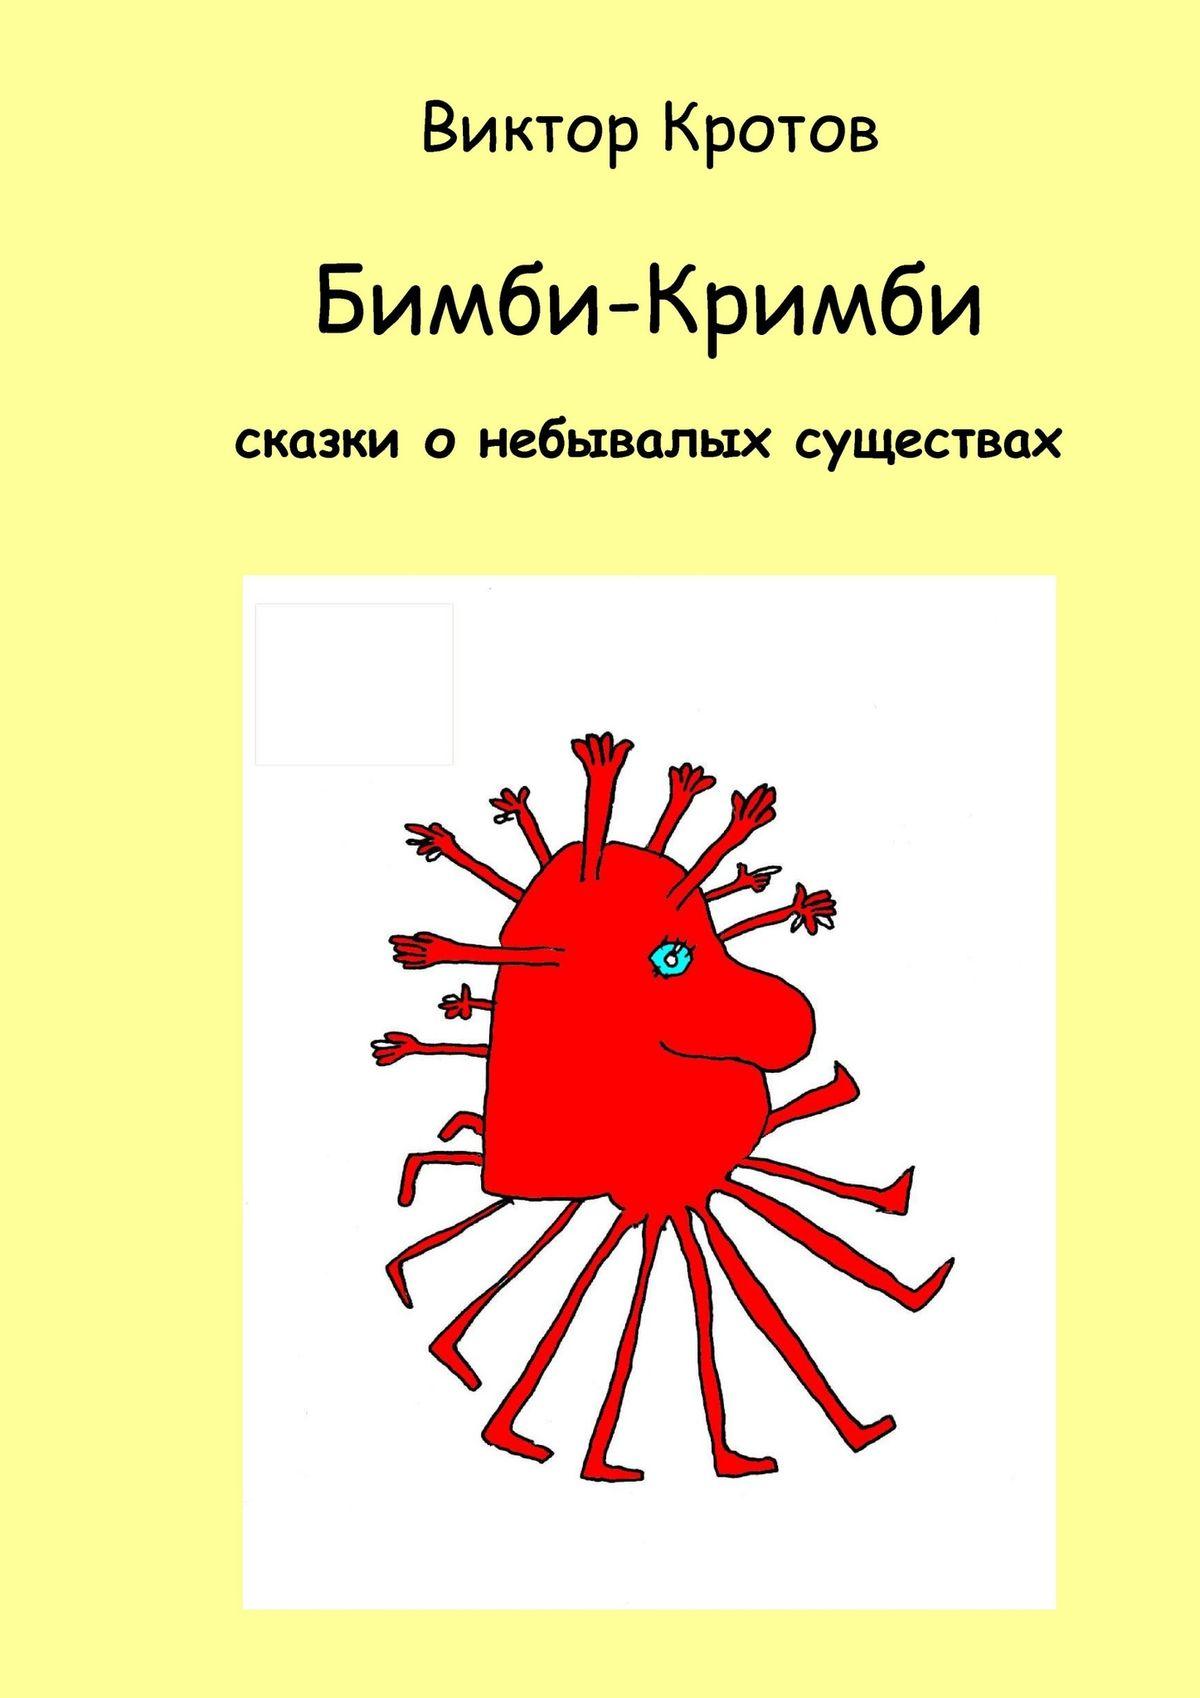 Виктор Кротов Бимби-Кримби. Сказки о небывалых существах